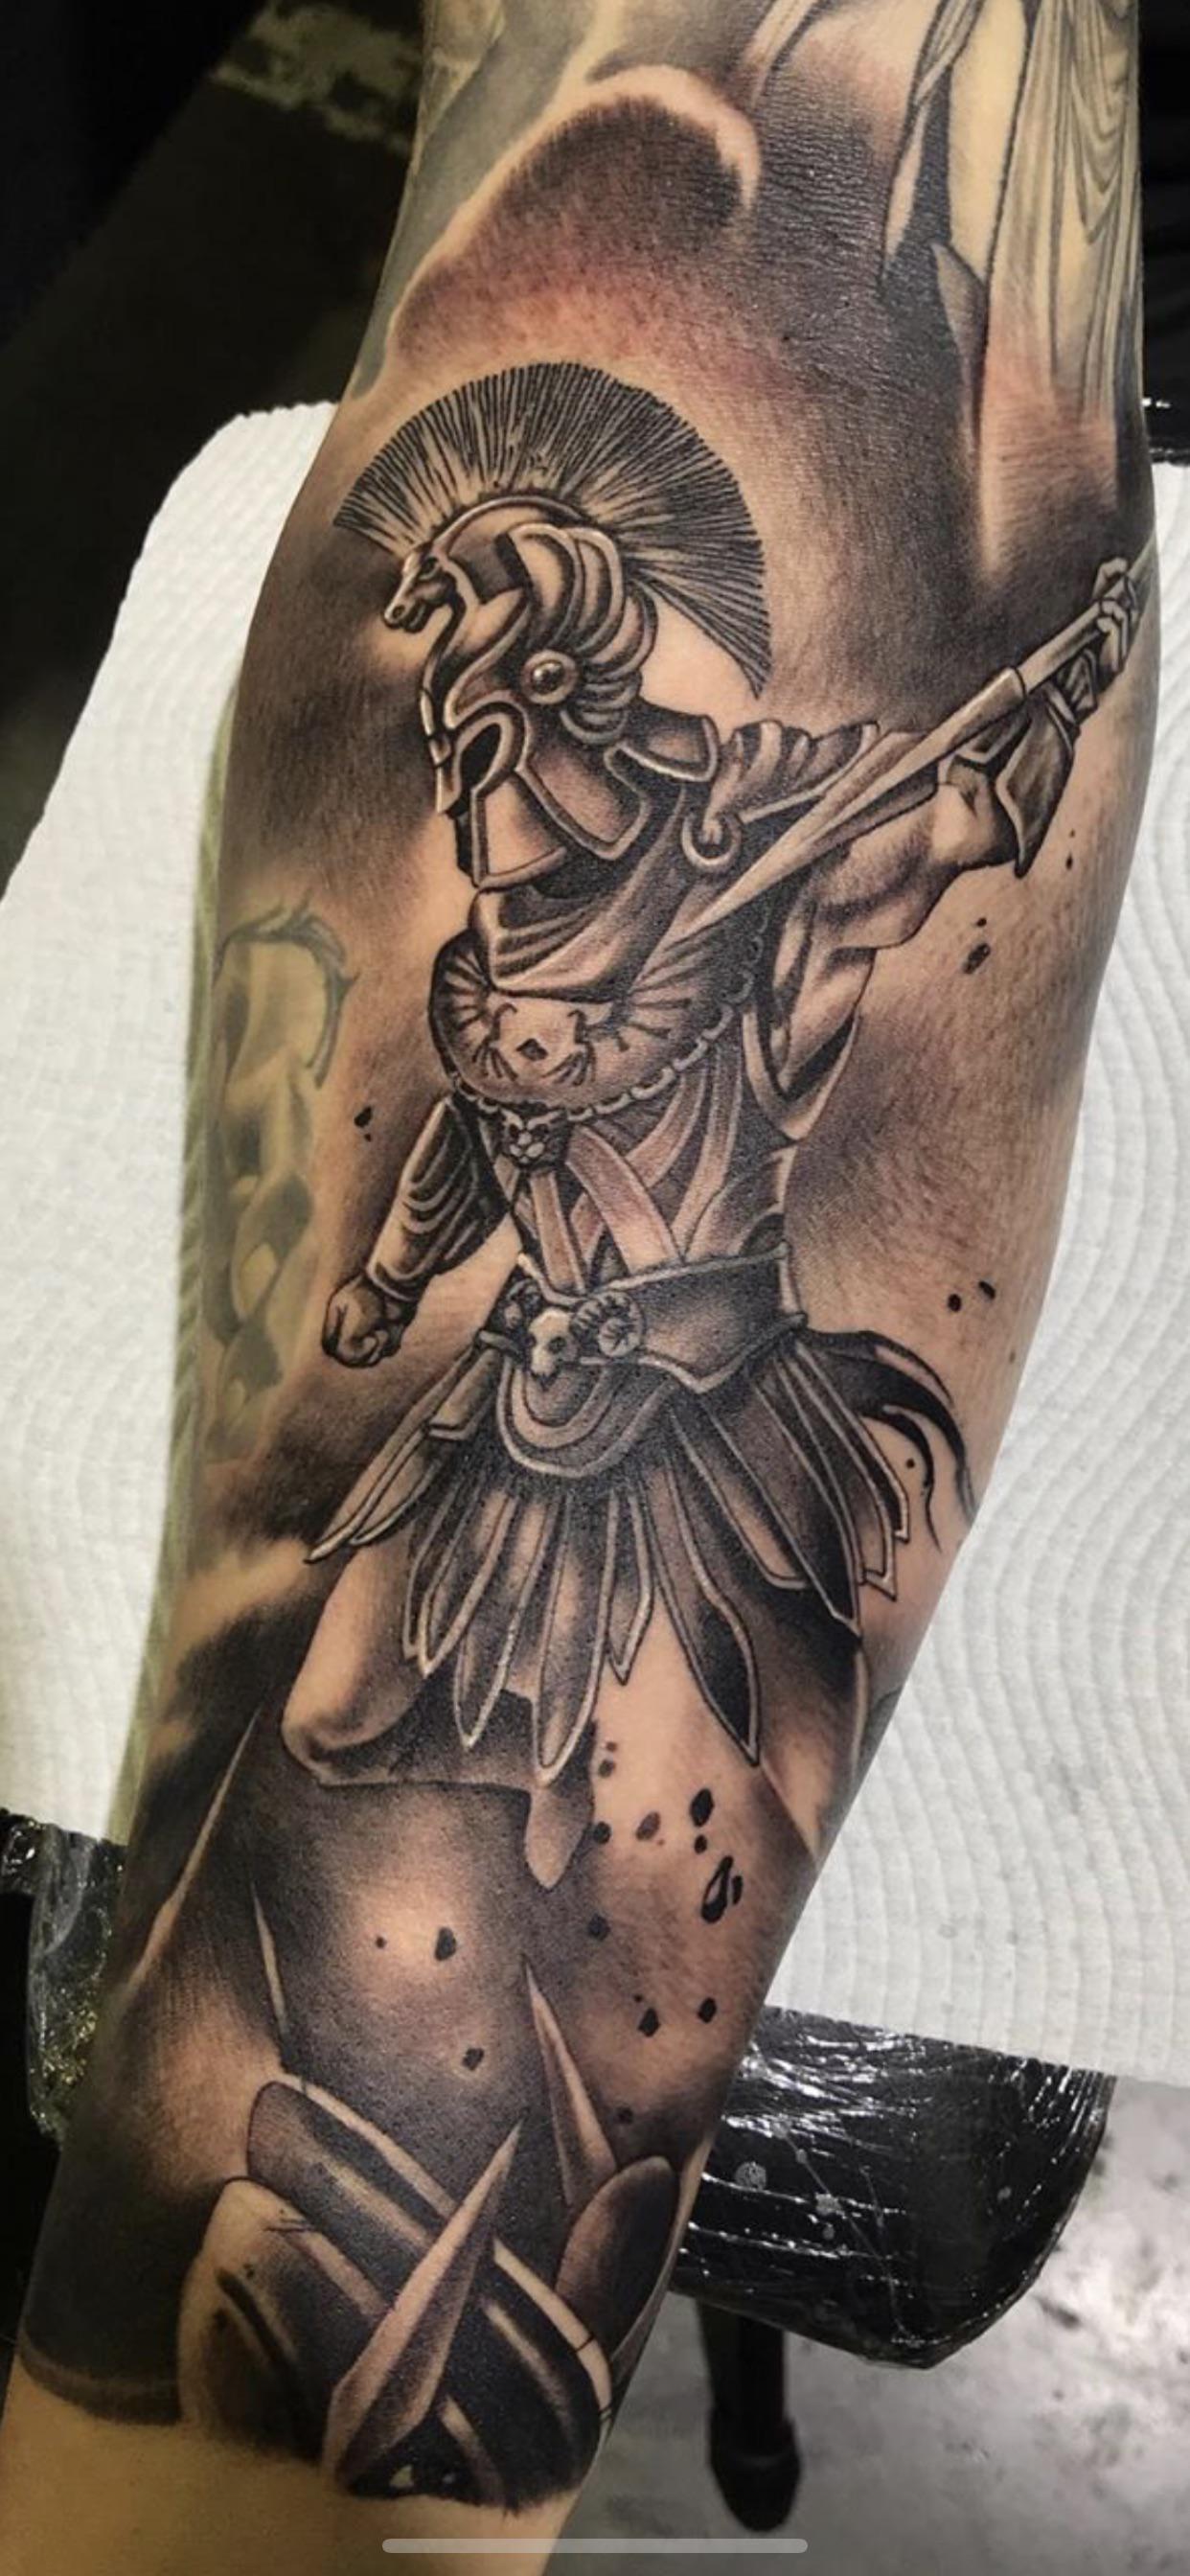 Final Part Of My Greek God Sleeve Ares By Tama From Phresh Ink In Gold Coast Aus Greek Tattoos Mythology Tattoos Gladiator Tattoo